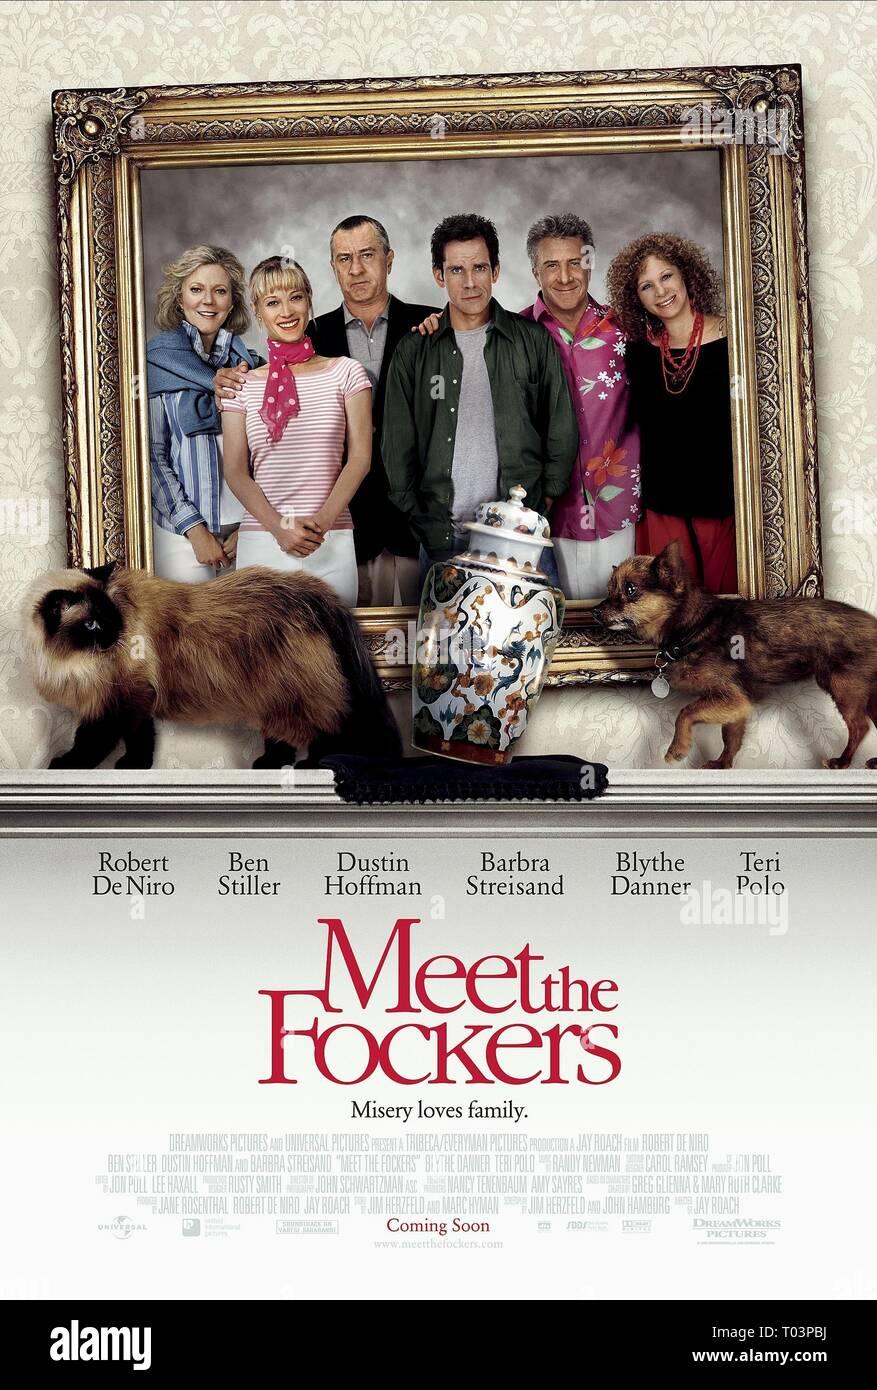 BLYTHE DANNER, TERI POLO, ROBERT DE NIRO, BEN STILLER, DUSTIN HOFFMAN, BARBRA STREISAND, MEET THE FOCKERS, 2004 - Stock Image